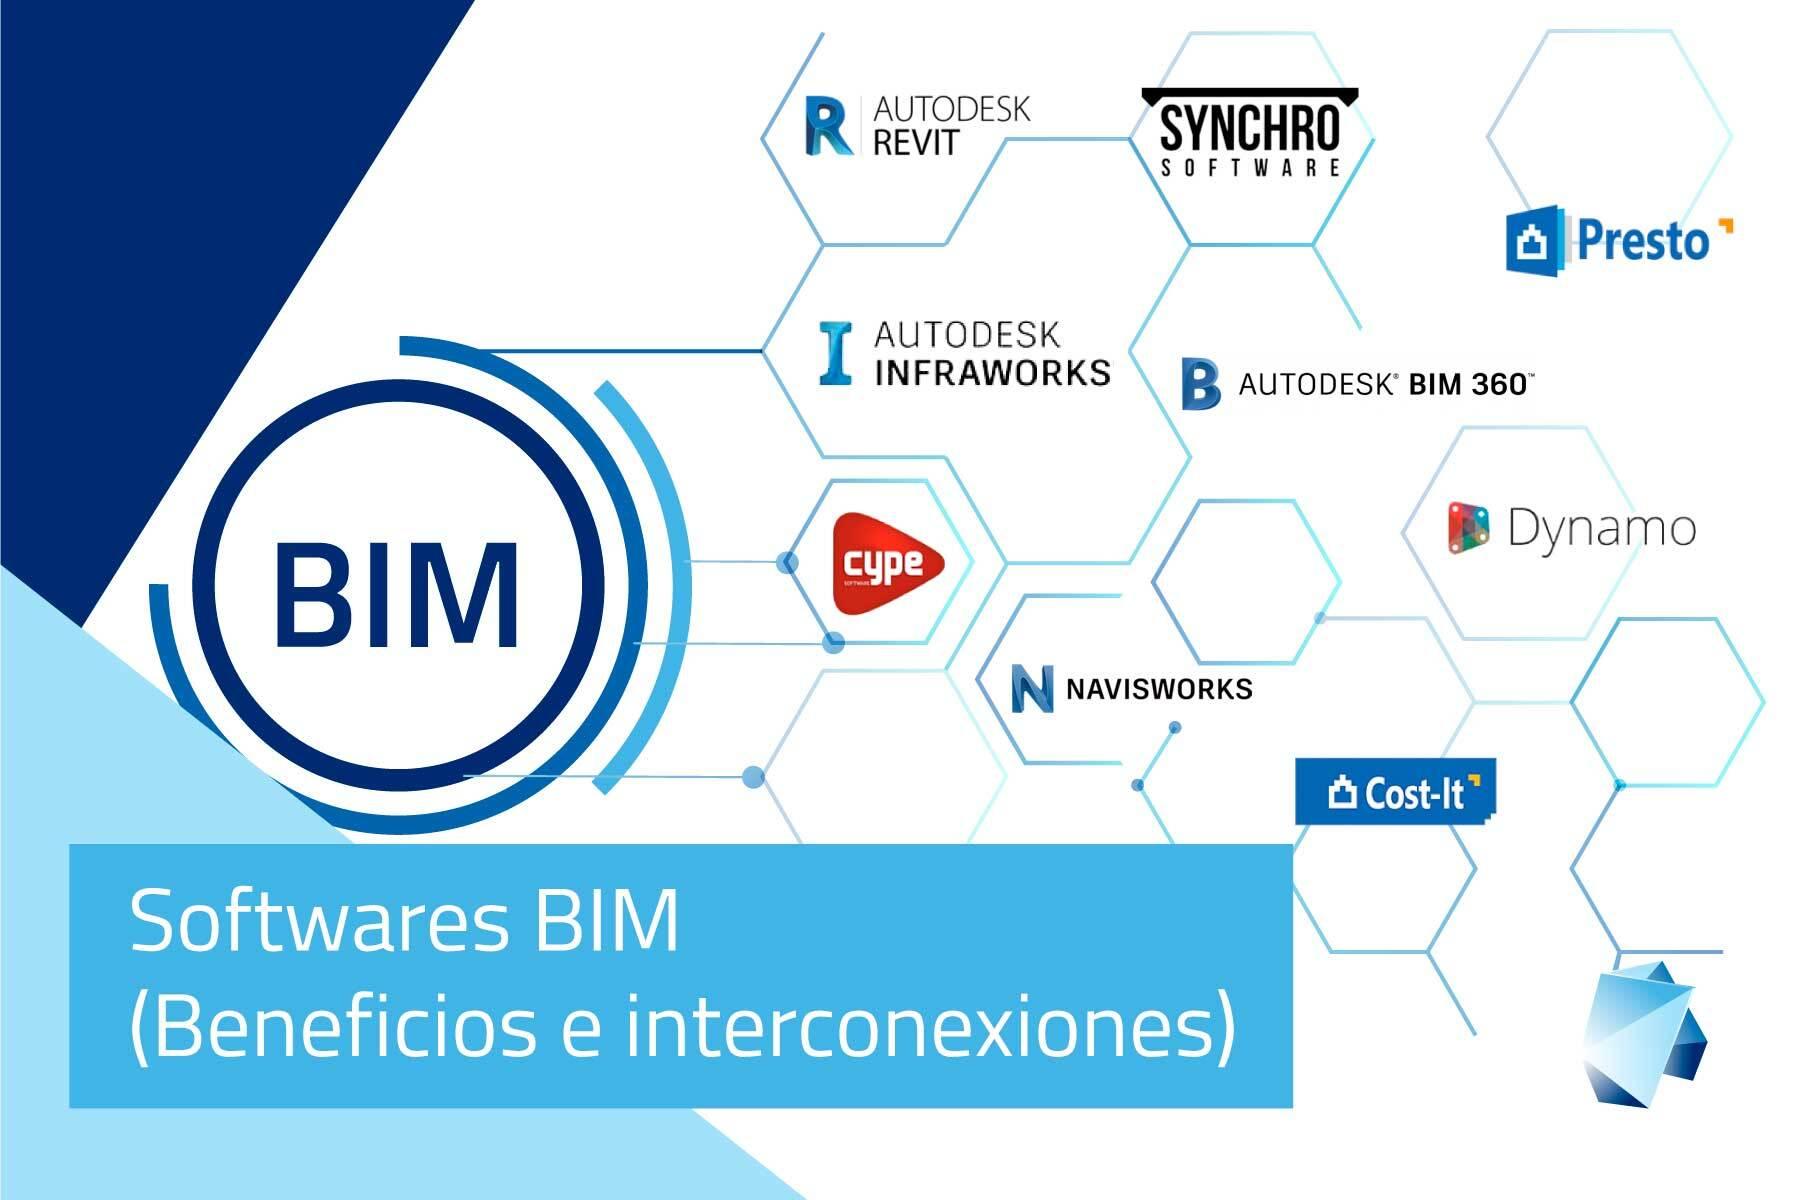 Softwares-bim-editeca